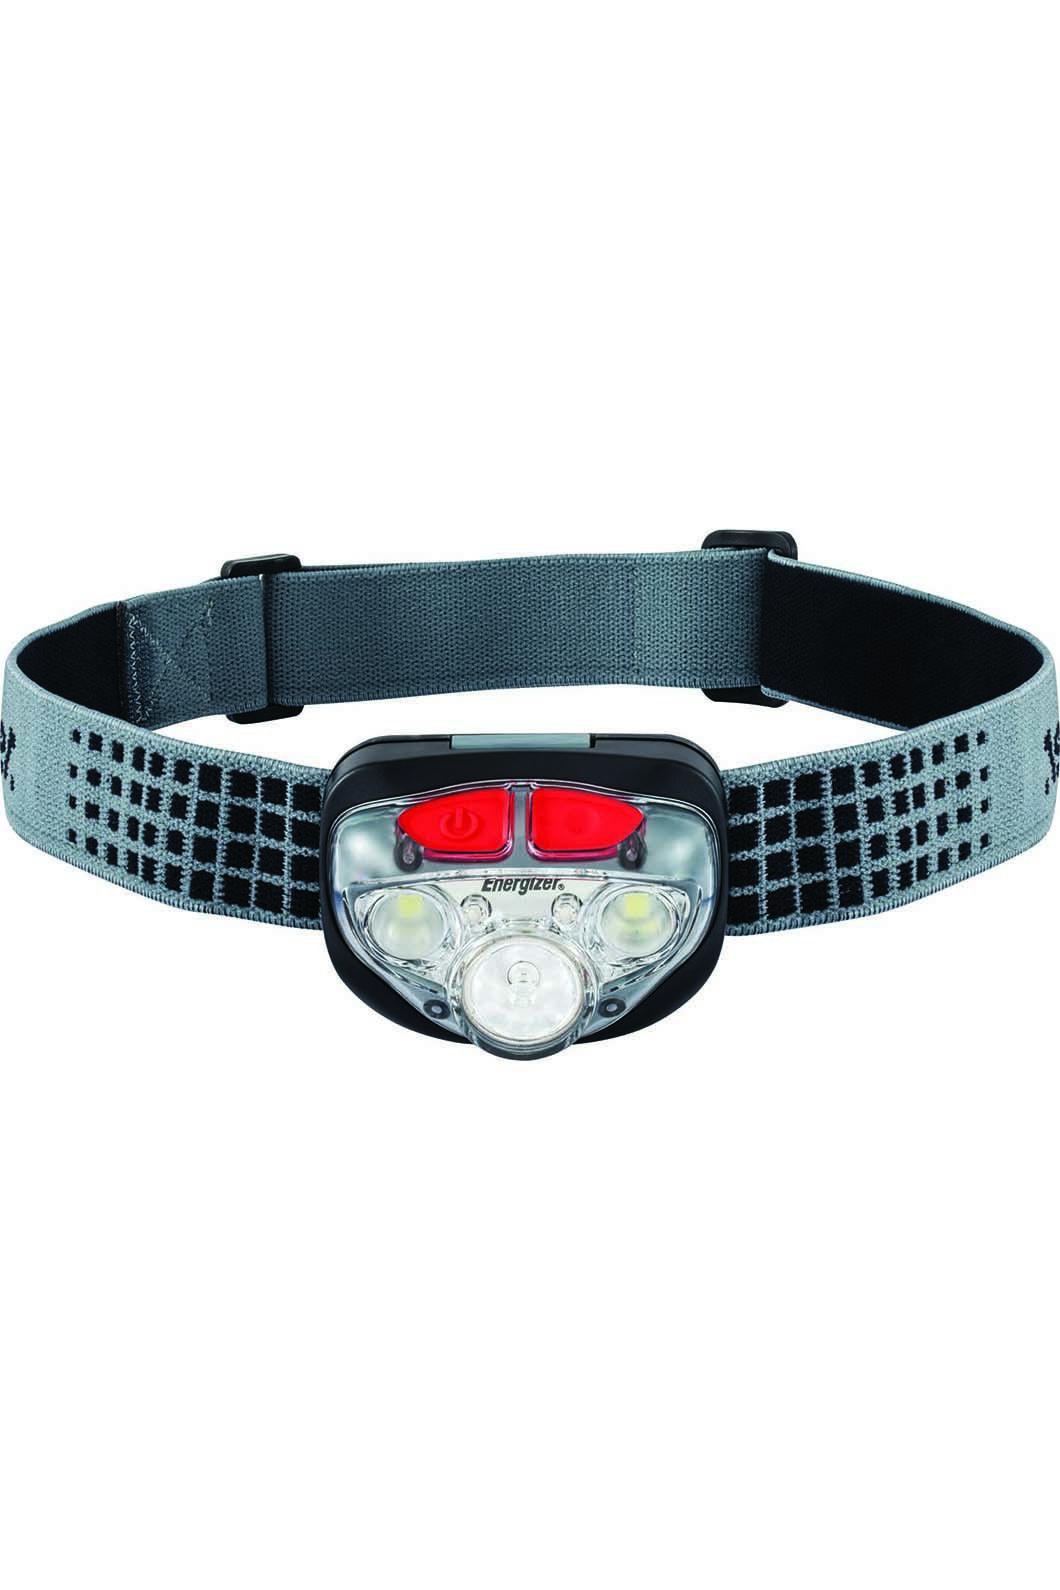 Energizer Vision HD Focus Headlamp, None, hi-res